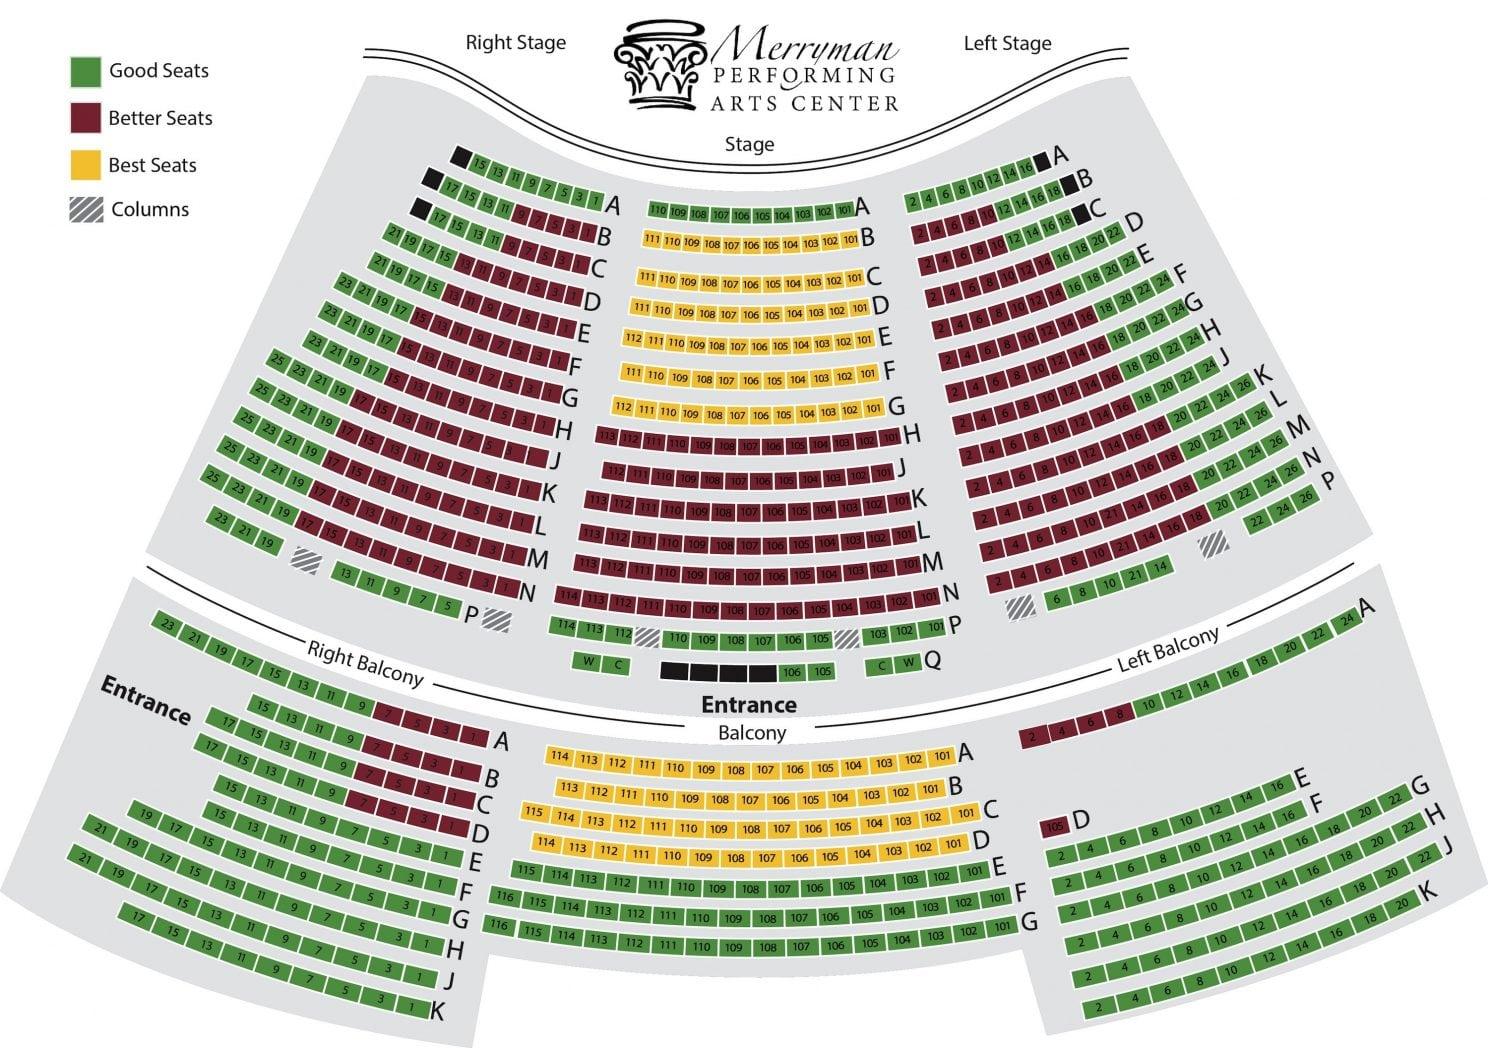 seating at the Merryman Performing Arts